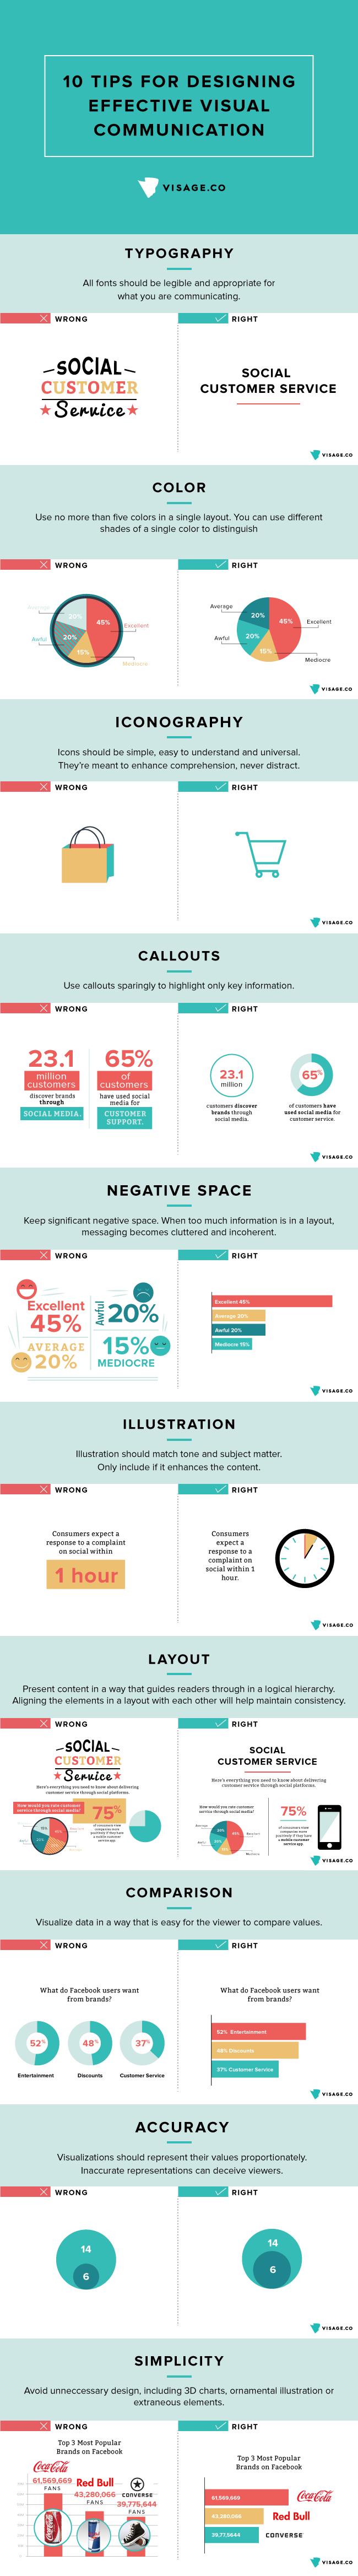 visage-hubspot-infographic